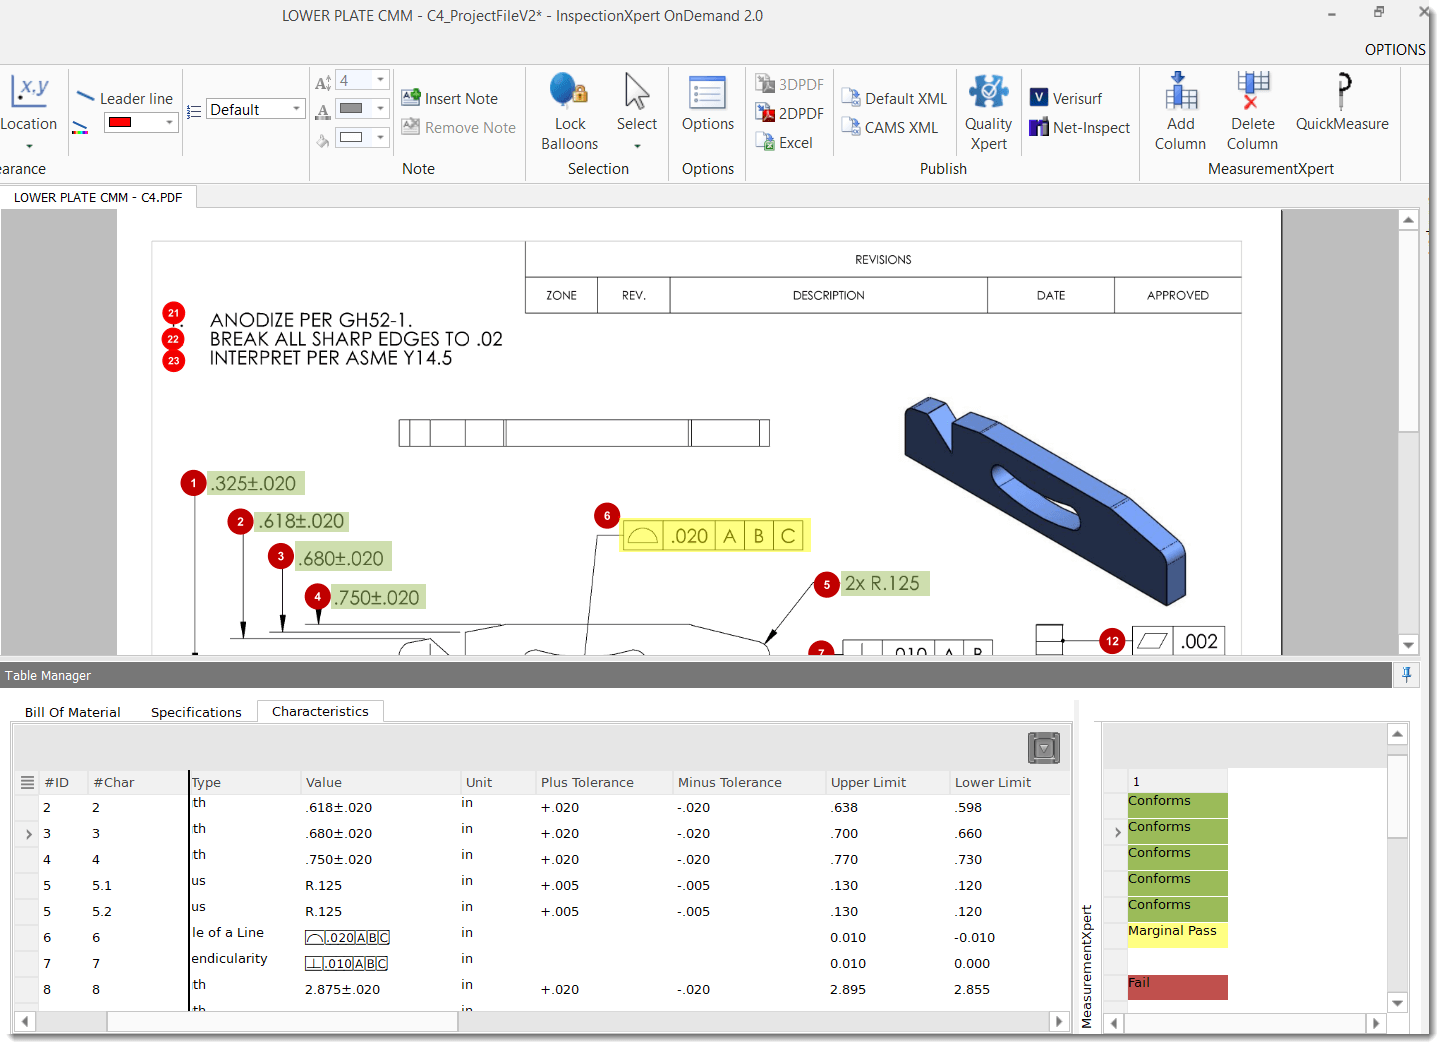 InspectionXpert's QuickMeasure tool